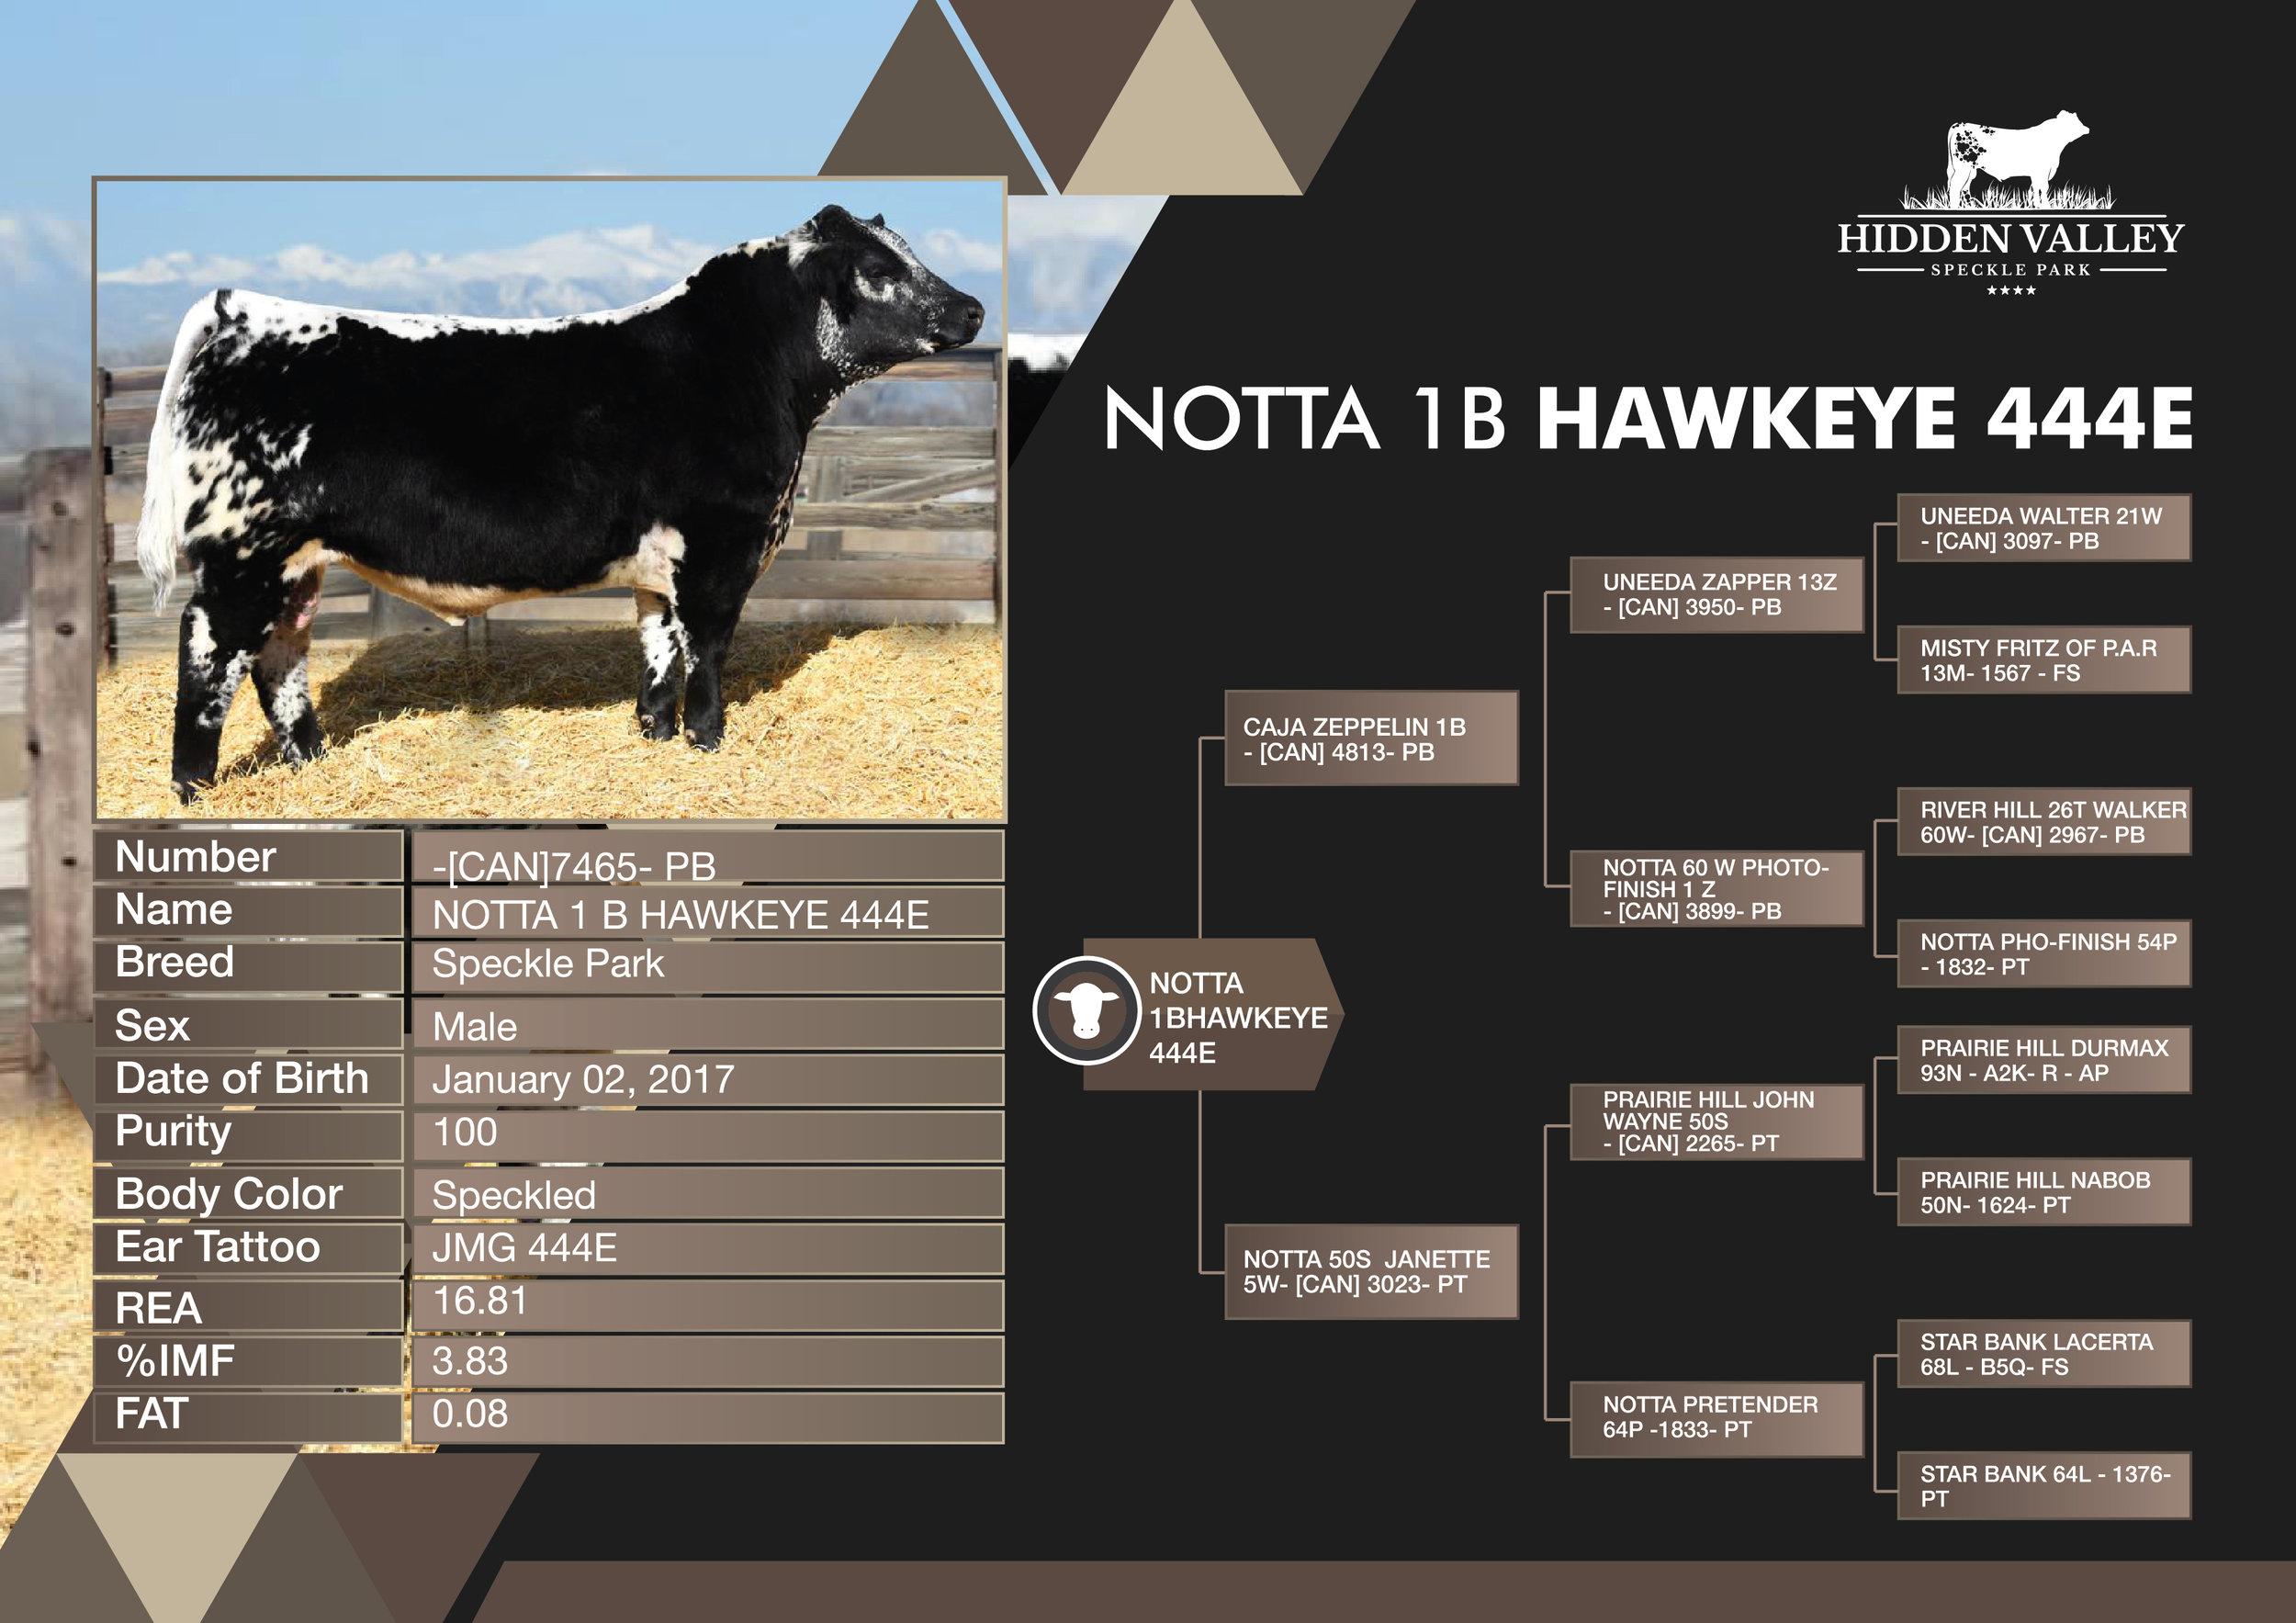 NOTTA_1B_HAWKEYE_444E_flyer01.jpg